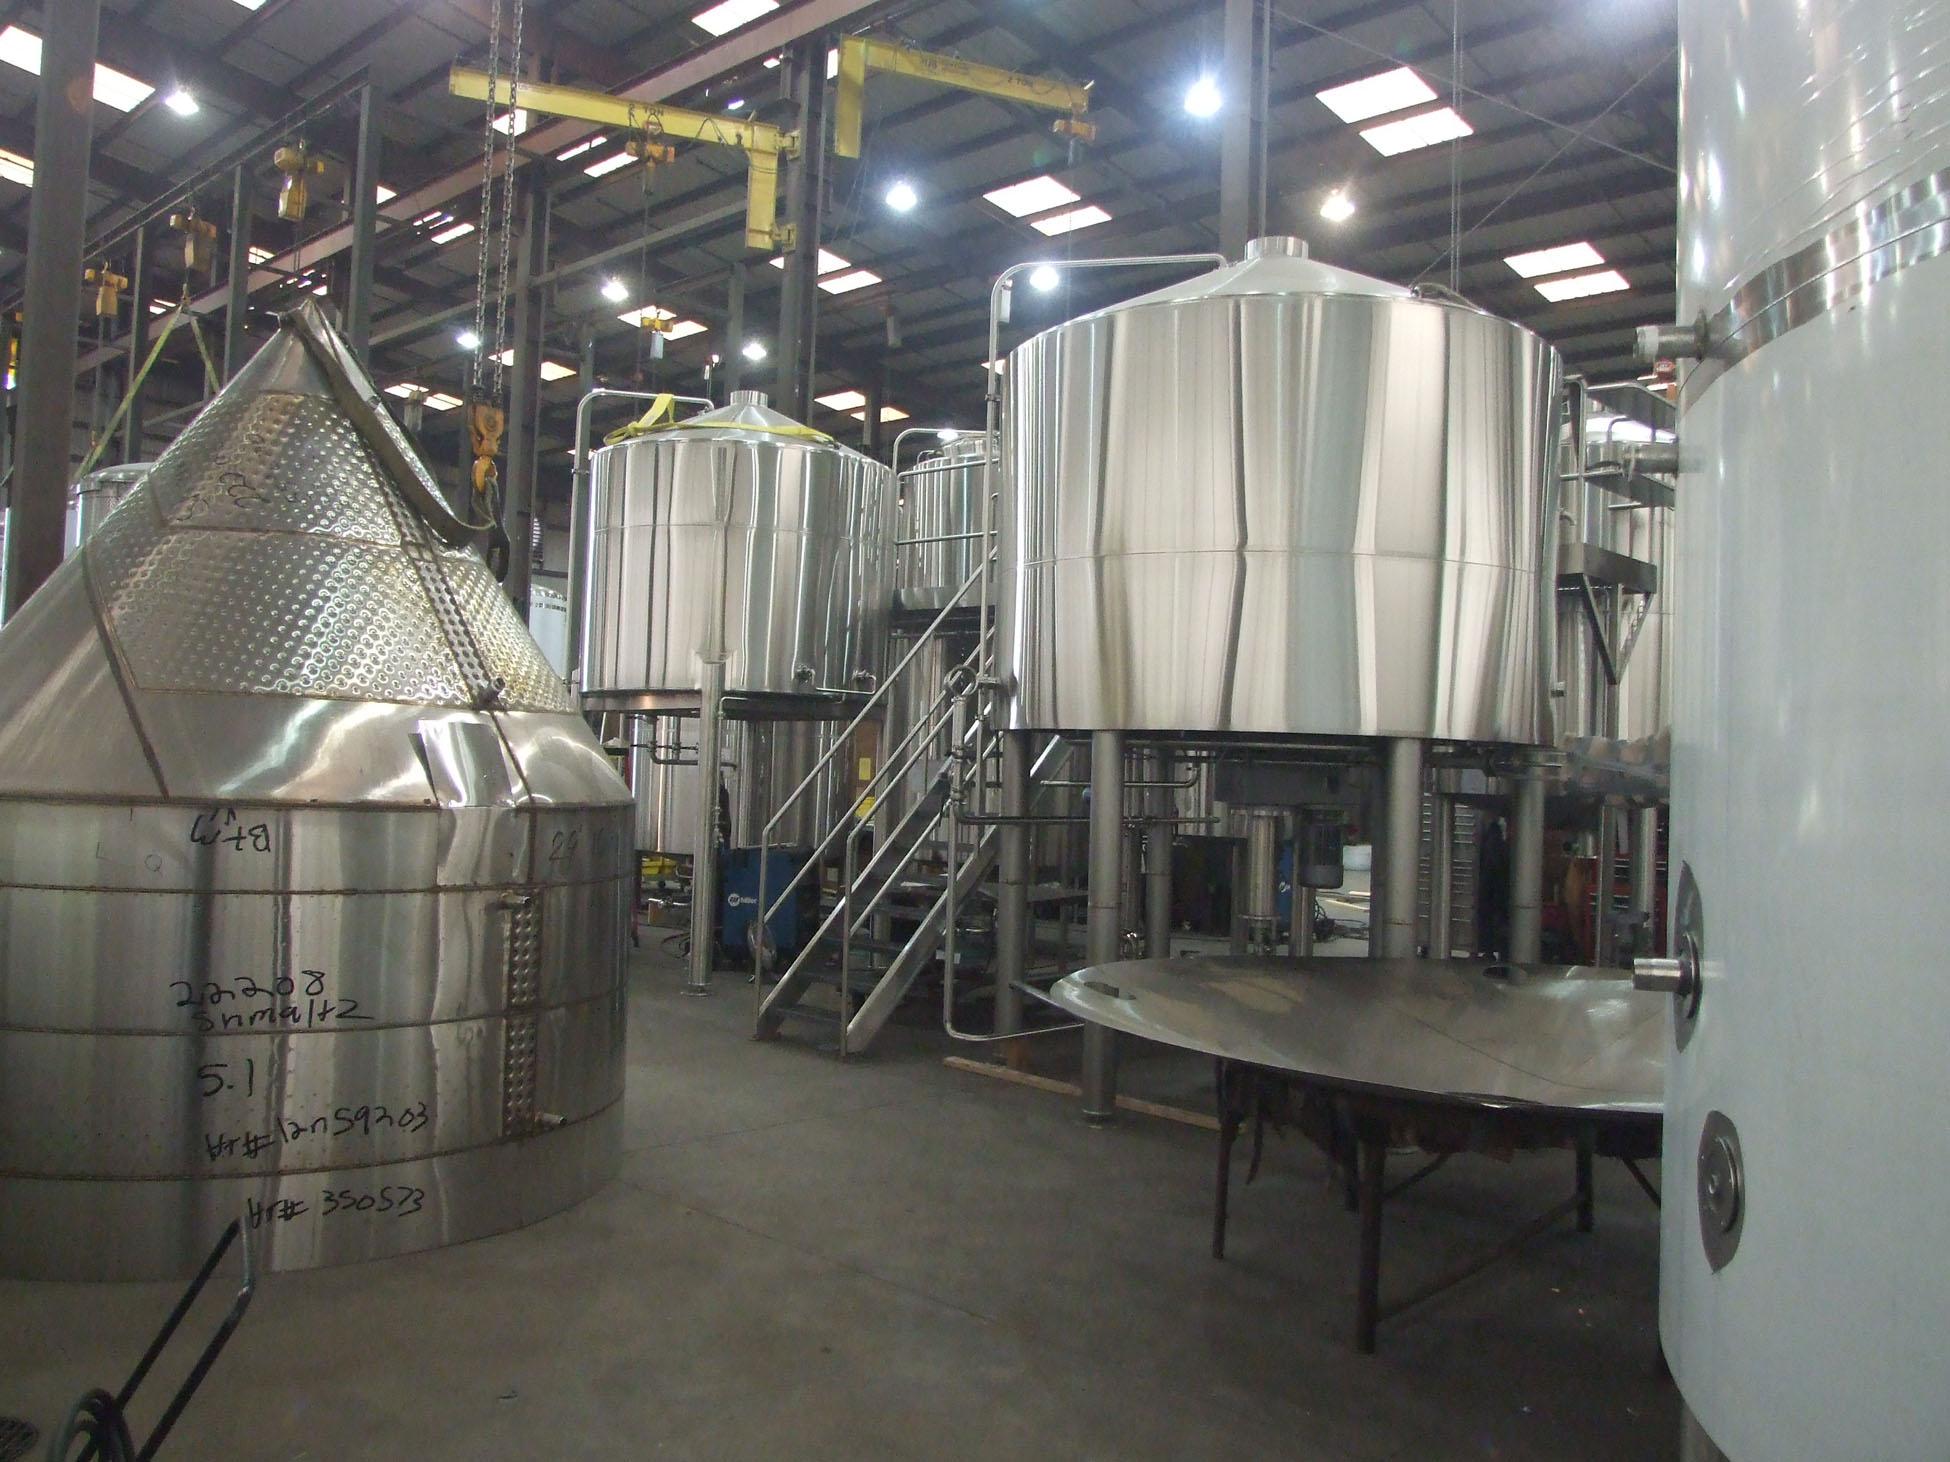 shmaltz-brewing-company-clifton-park.jpg